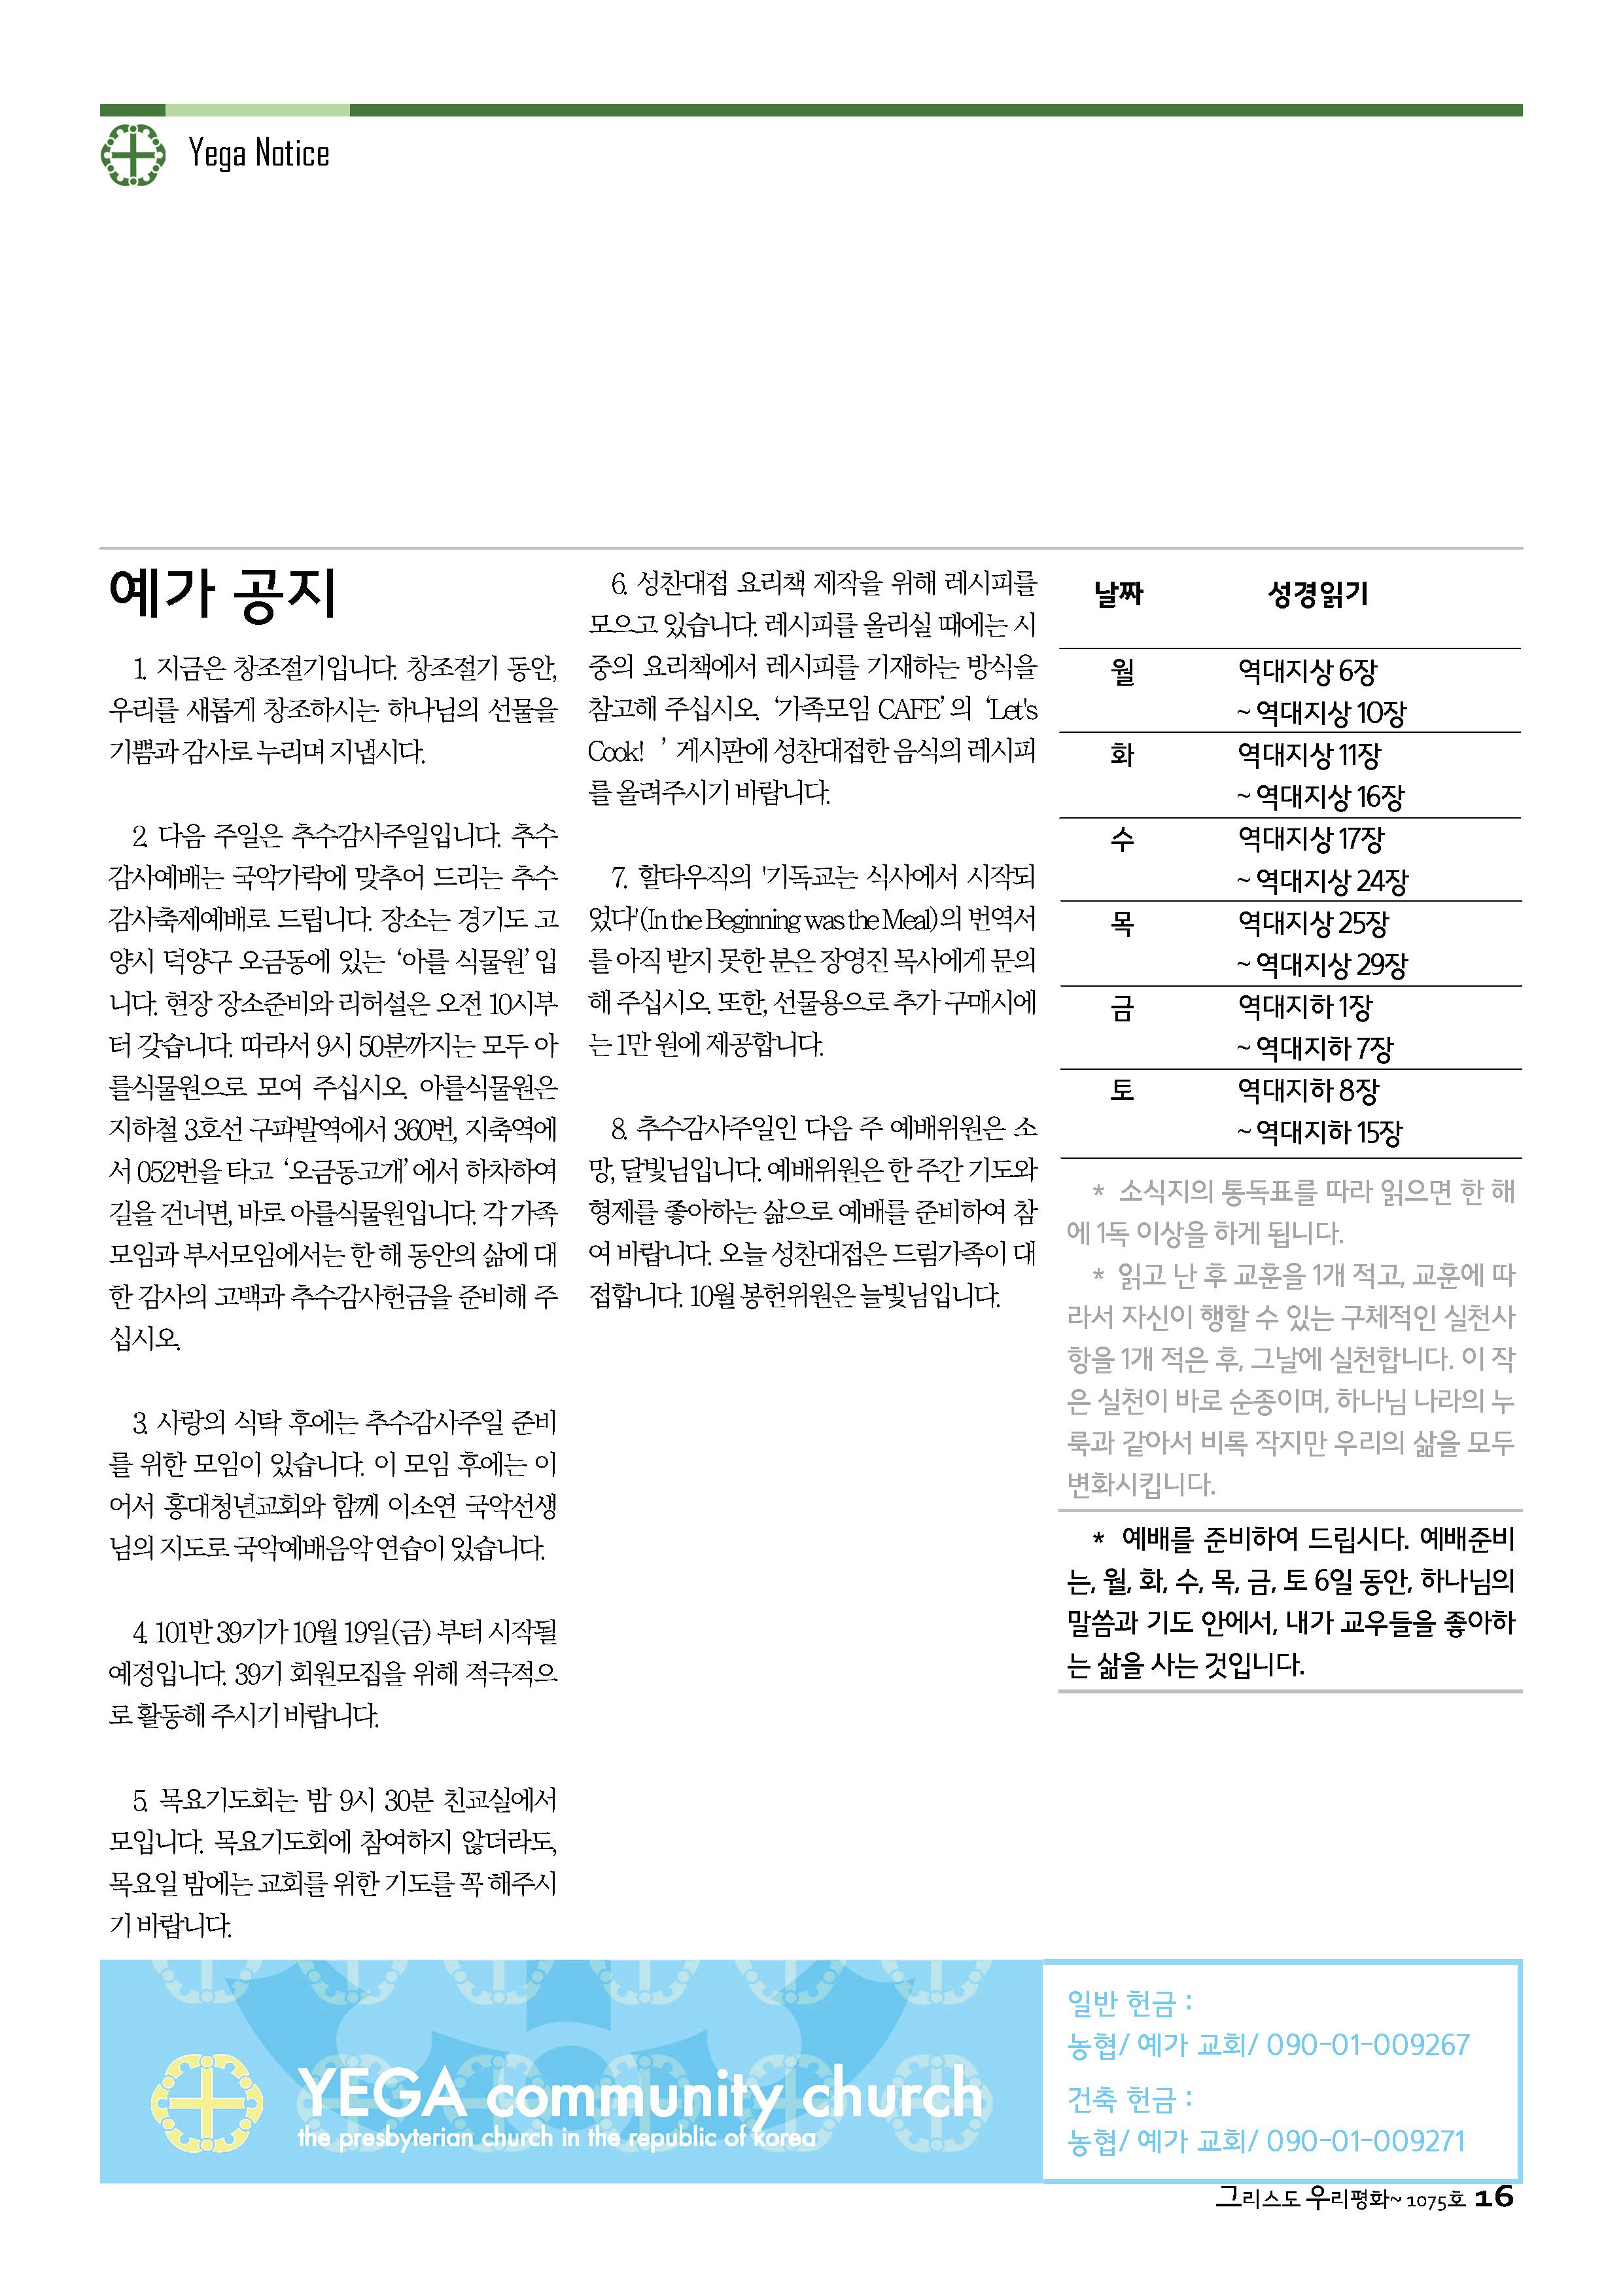 18sdjb1007_페이지_16.png